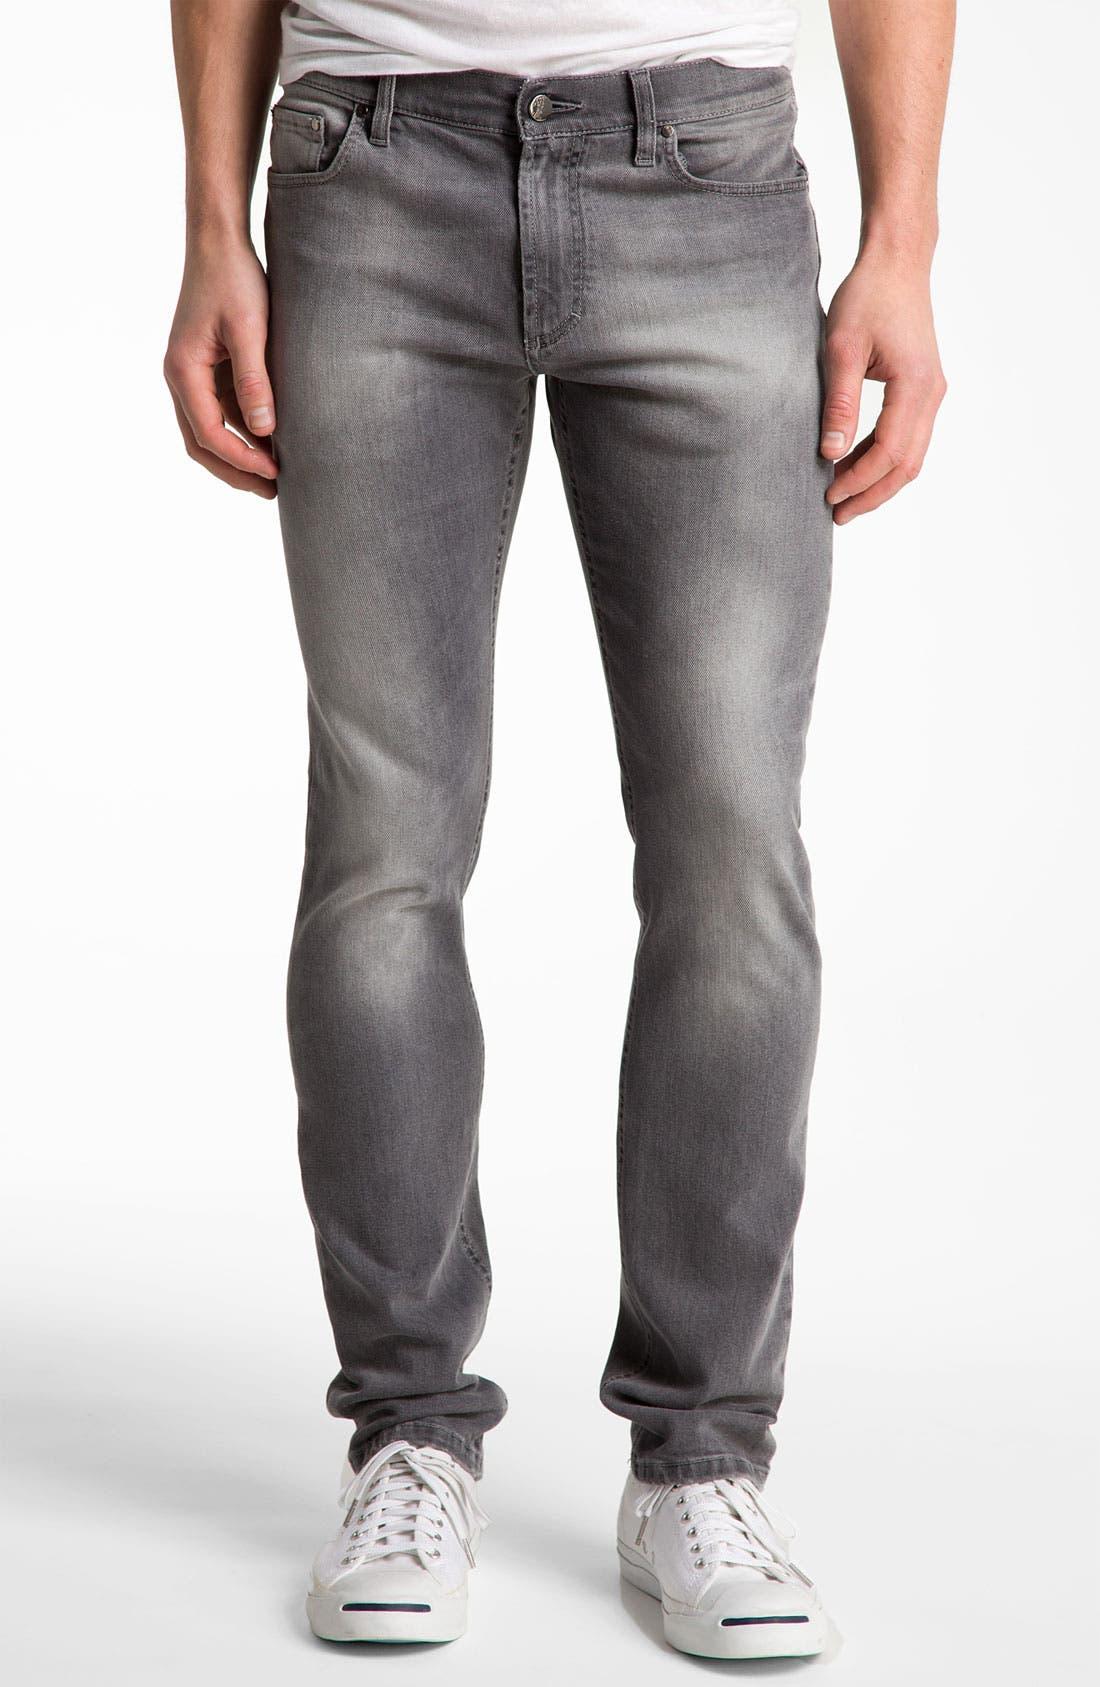 Alternate Image 1 Selected - Versace Slim Straight Jeans (Grey)